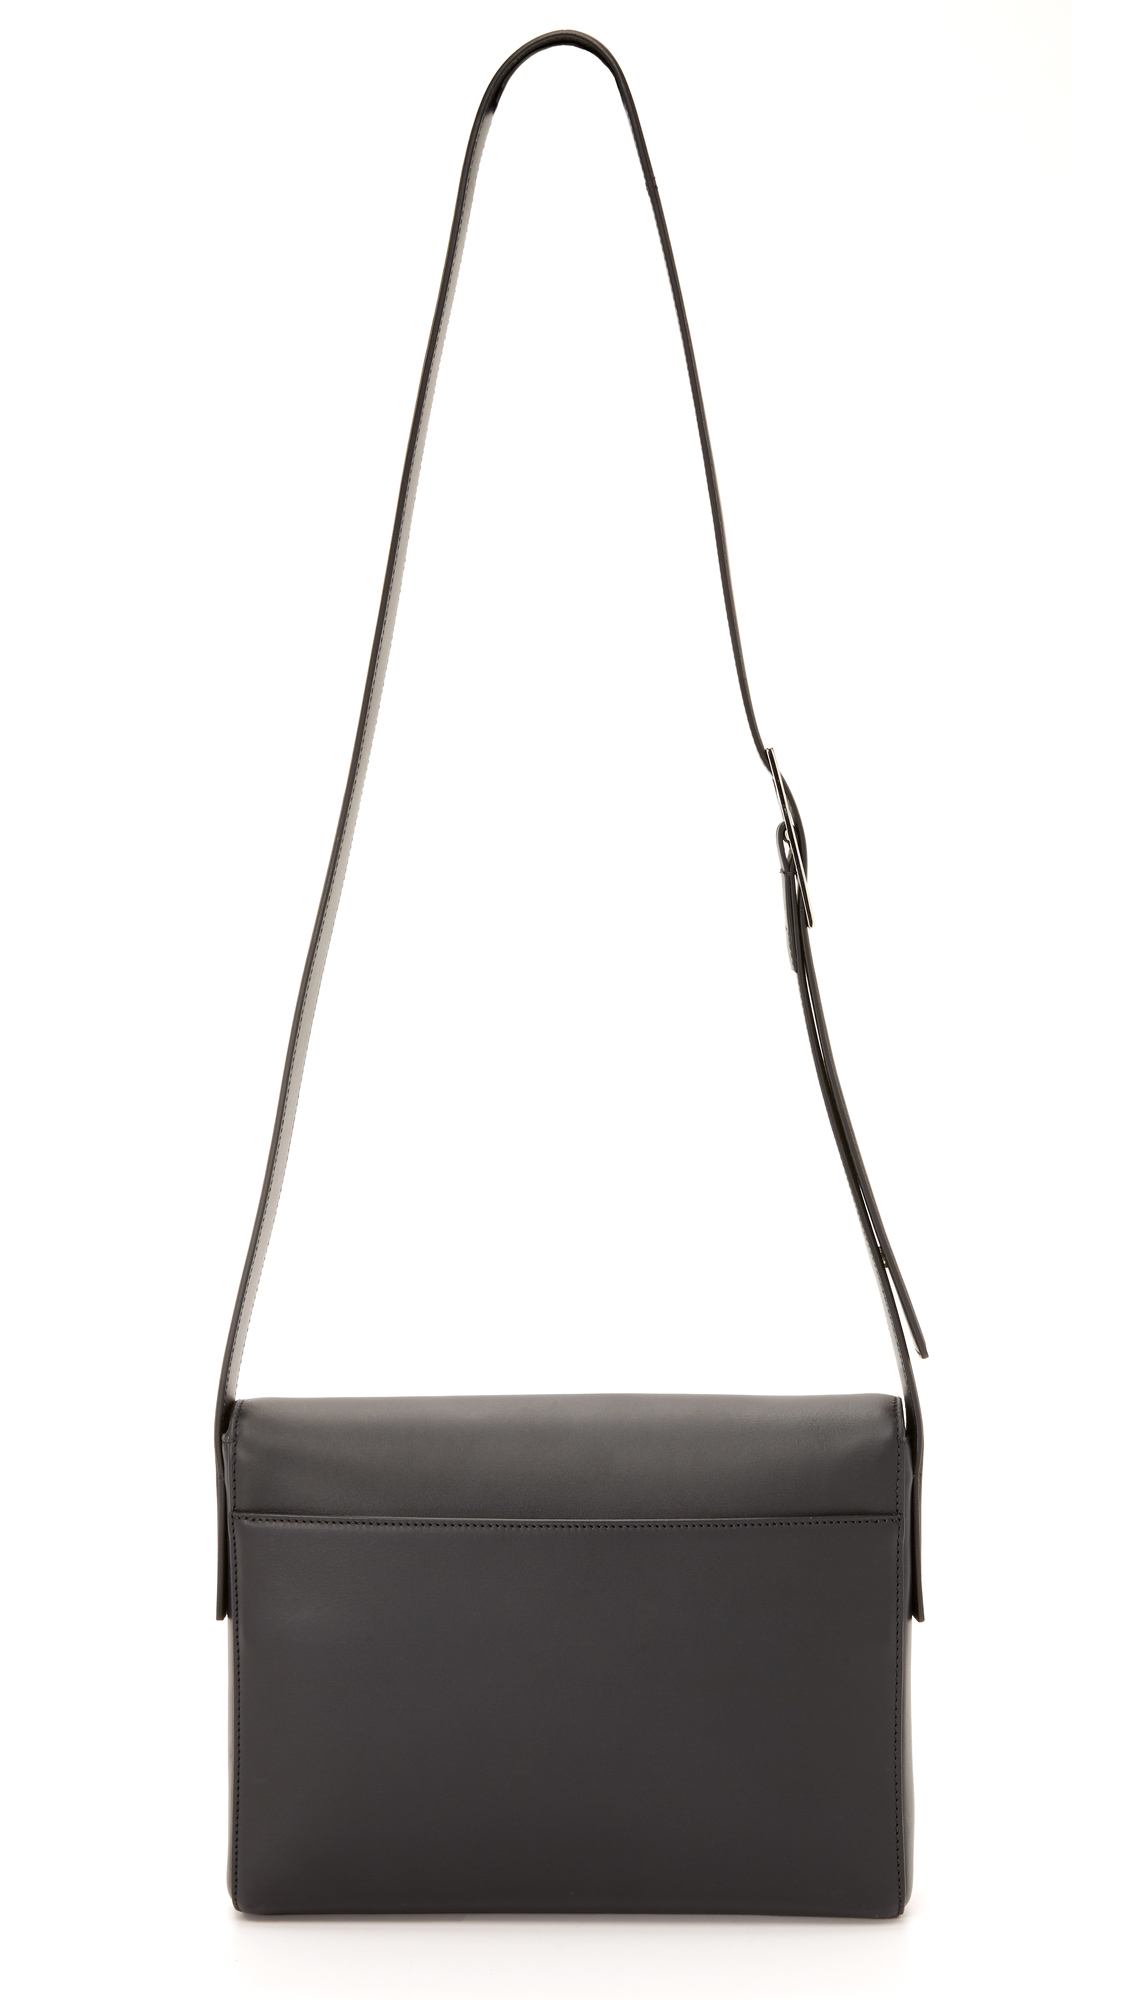 Vince Medium Cross Body Bag in Black